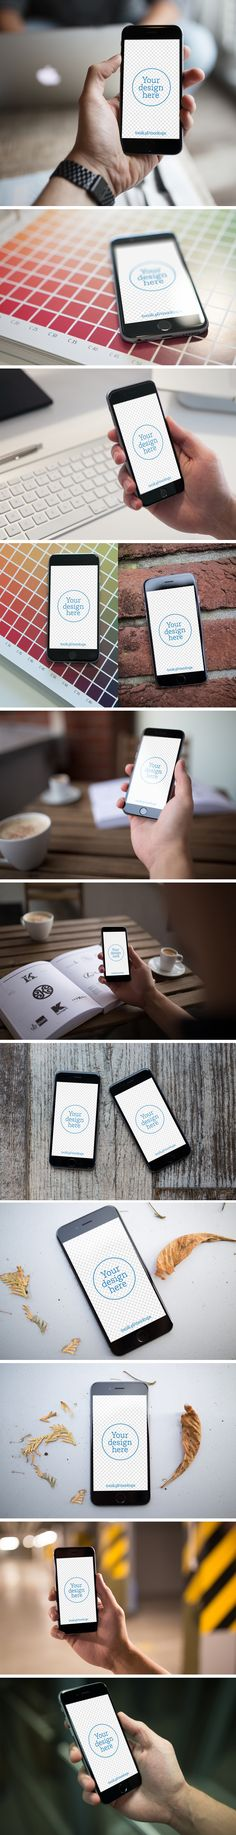 12 iPhone 6 Photo MockUps | GraphicBurger